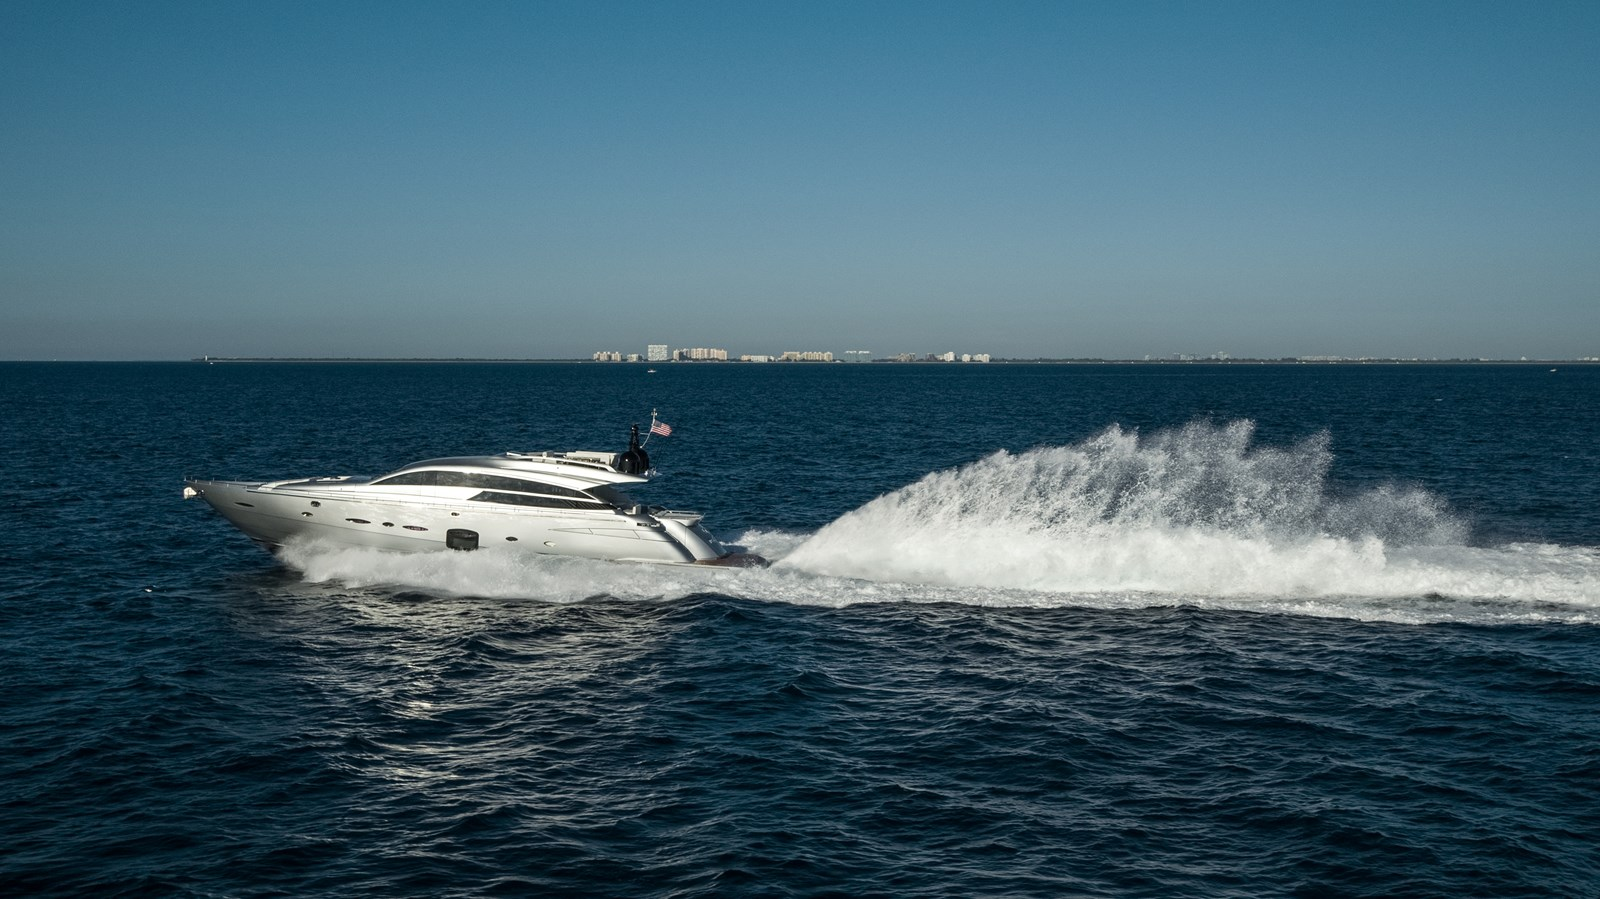 DJI_0007 2012 PERSHING  Motor Yacht 2810217